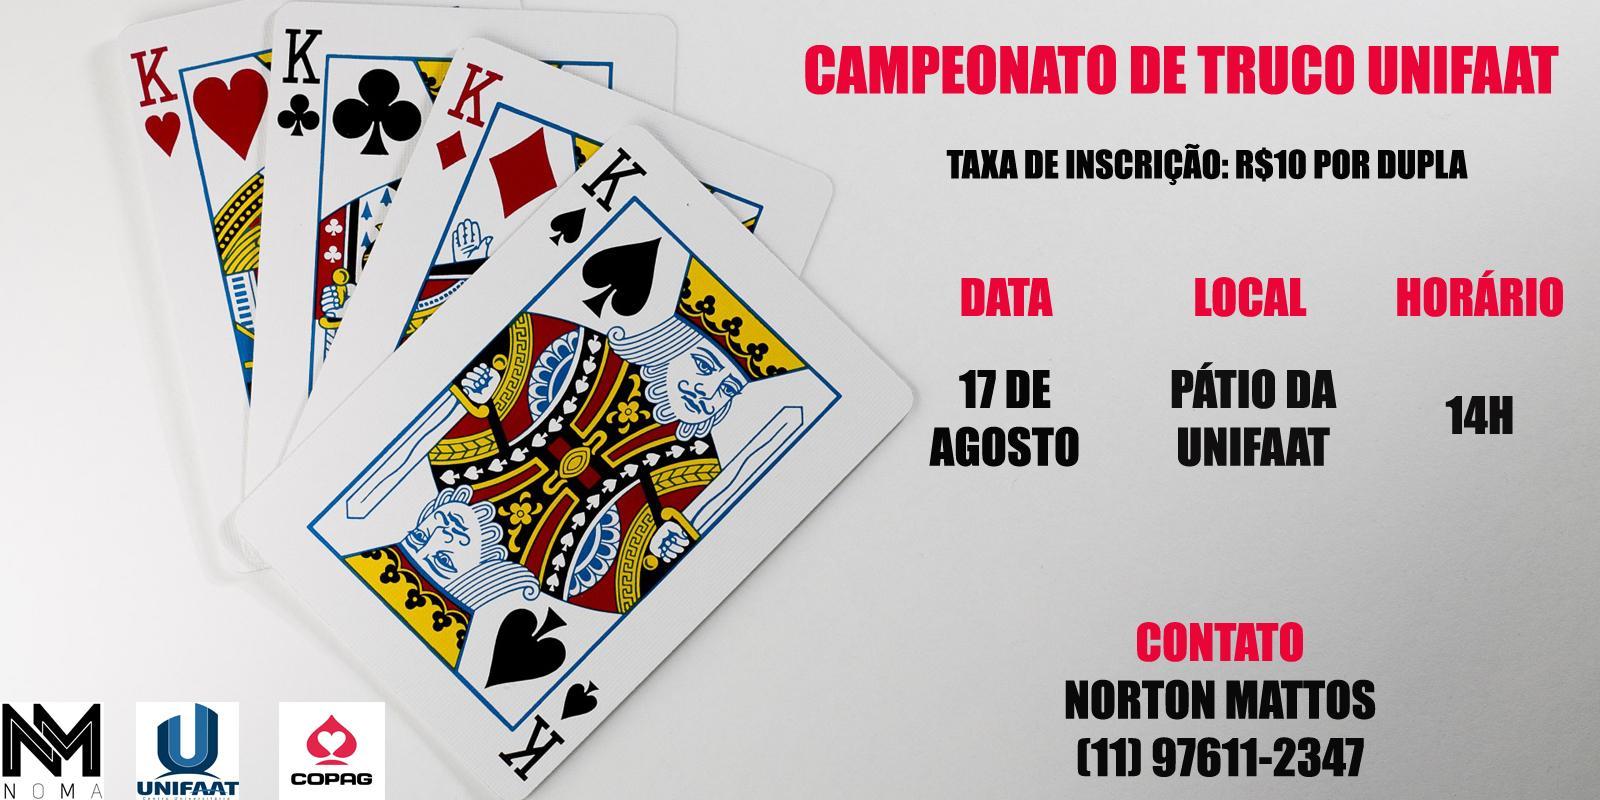 Campeonato de Truco será realizado na UNIFAAT